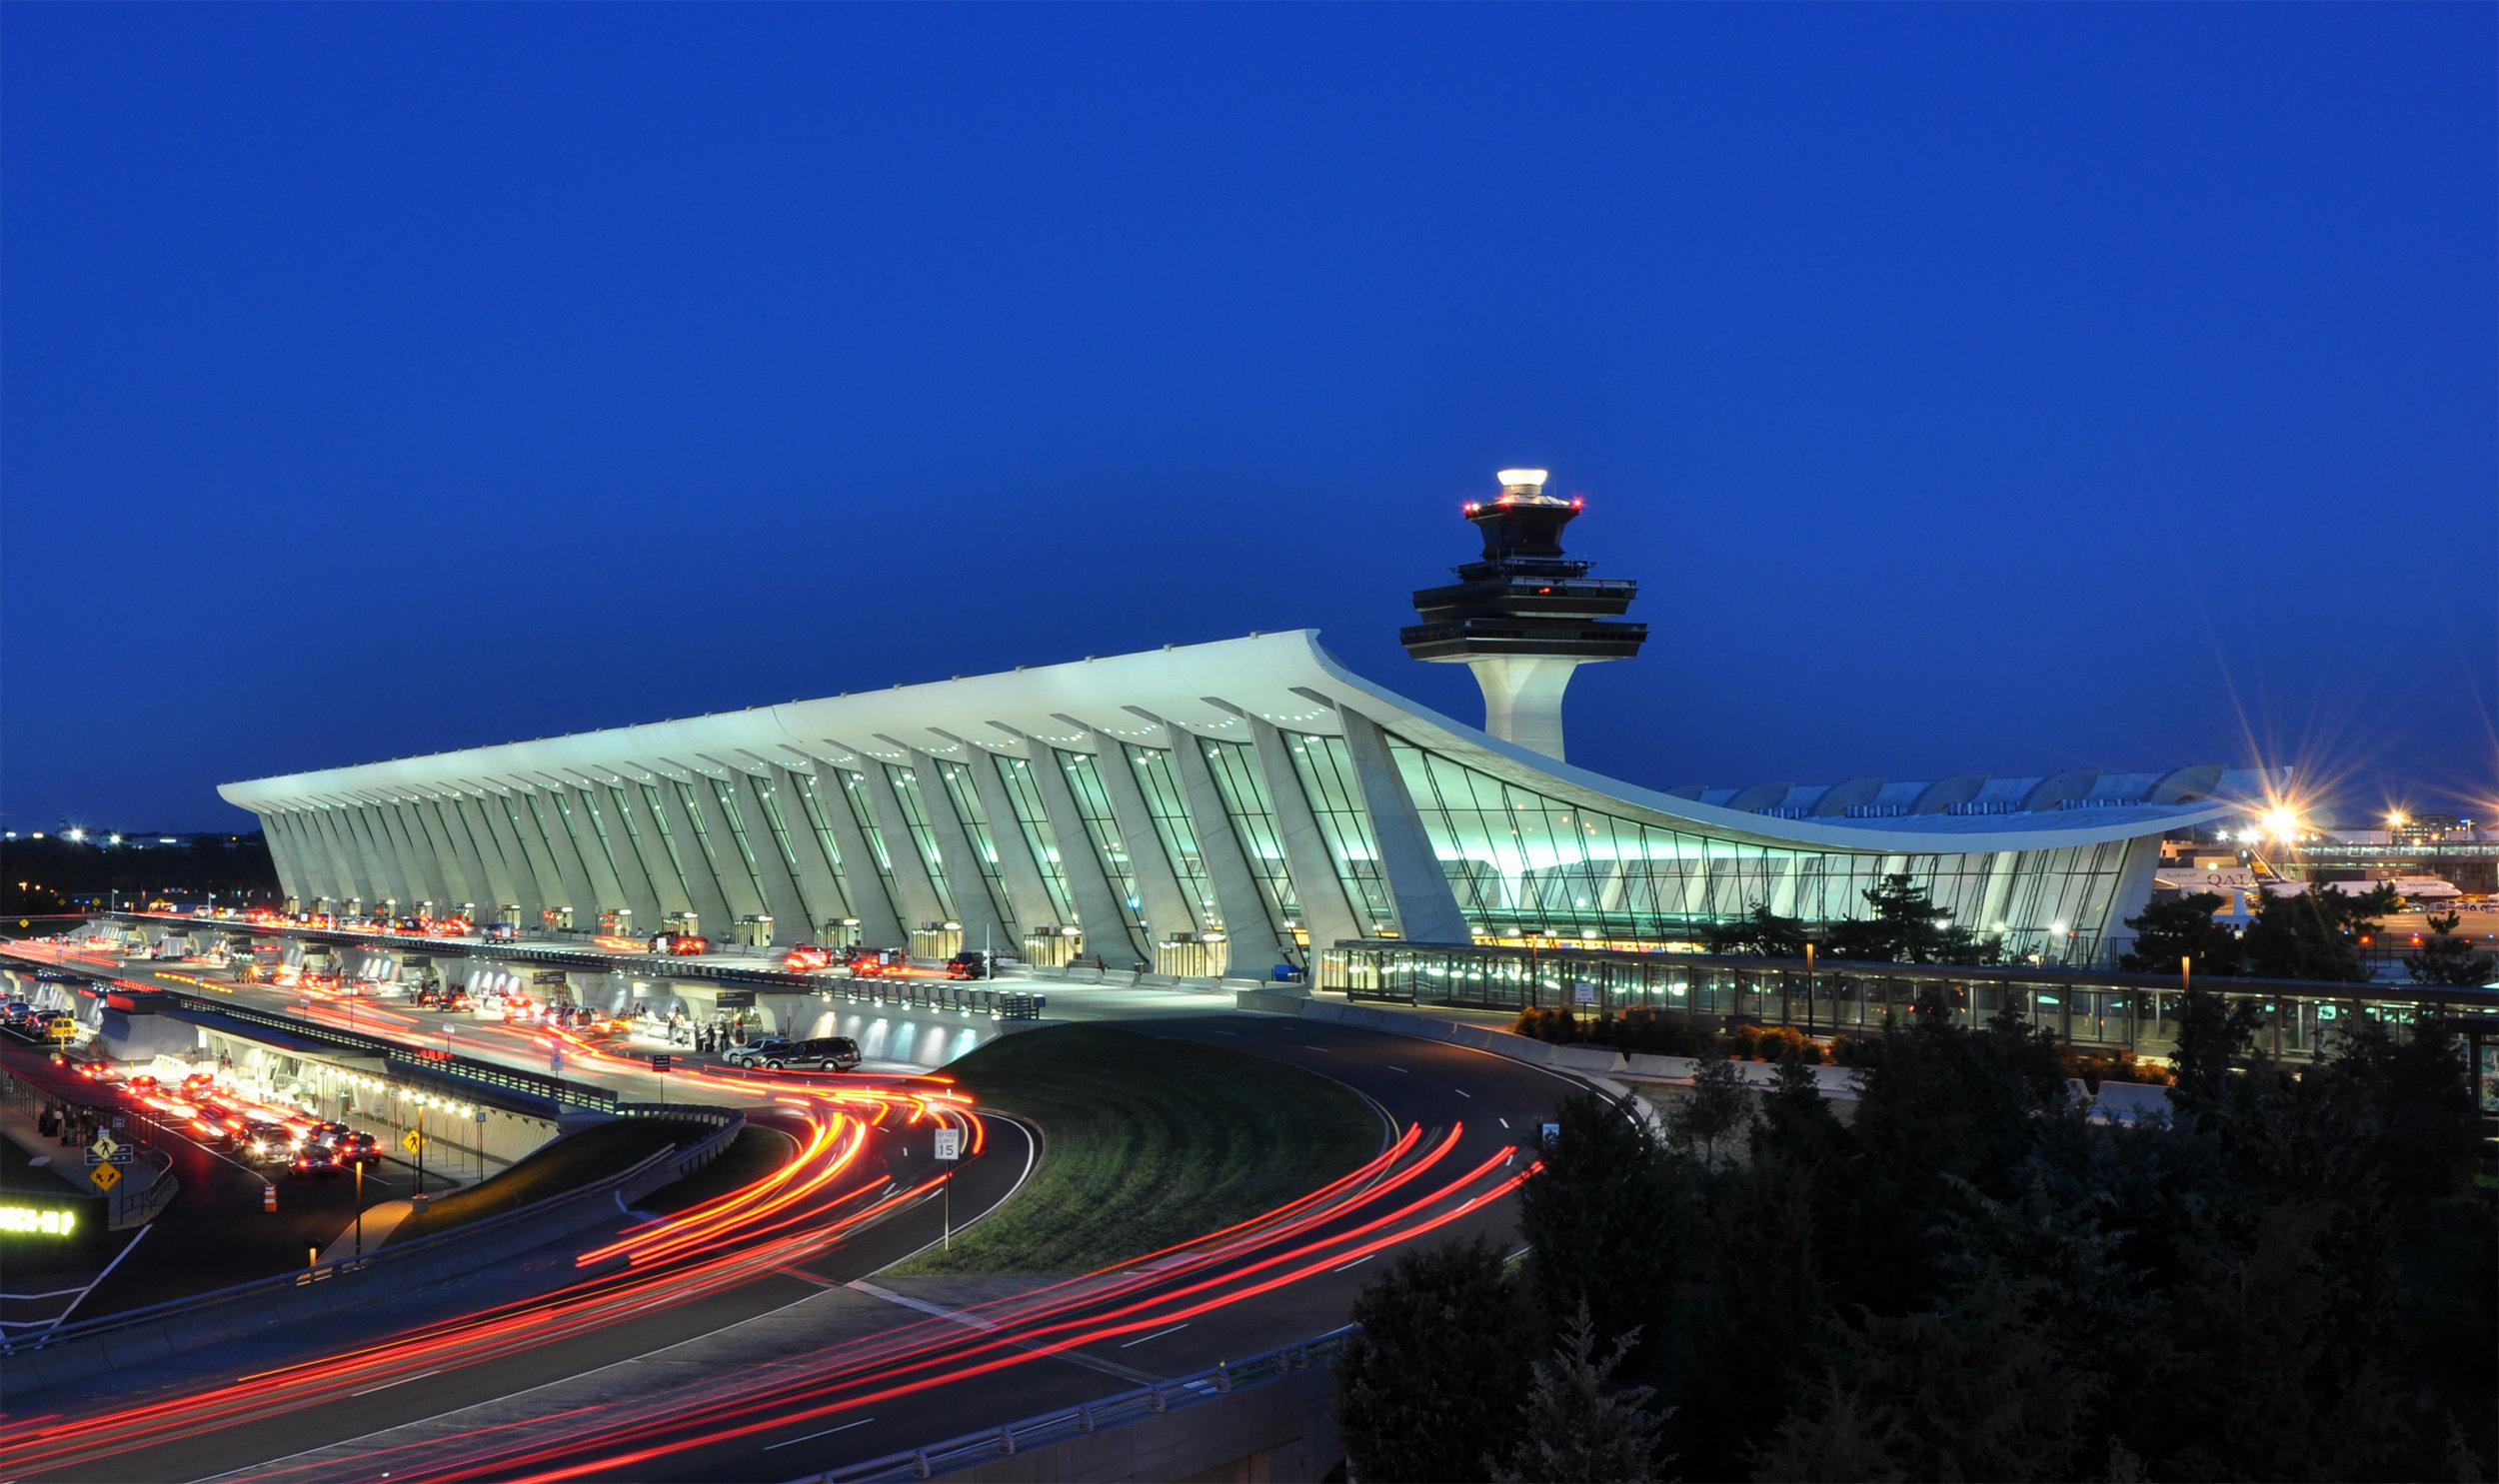 Dulles terminal building at dusk. ( Photo by By Joe Ravi , via Wikimedia Commons,CC BY-SA 3.0)